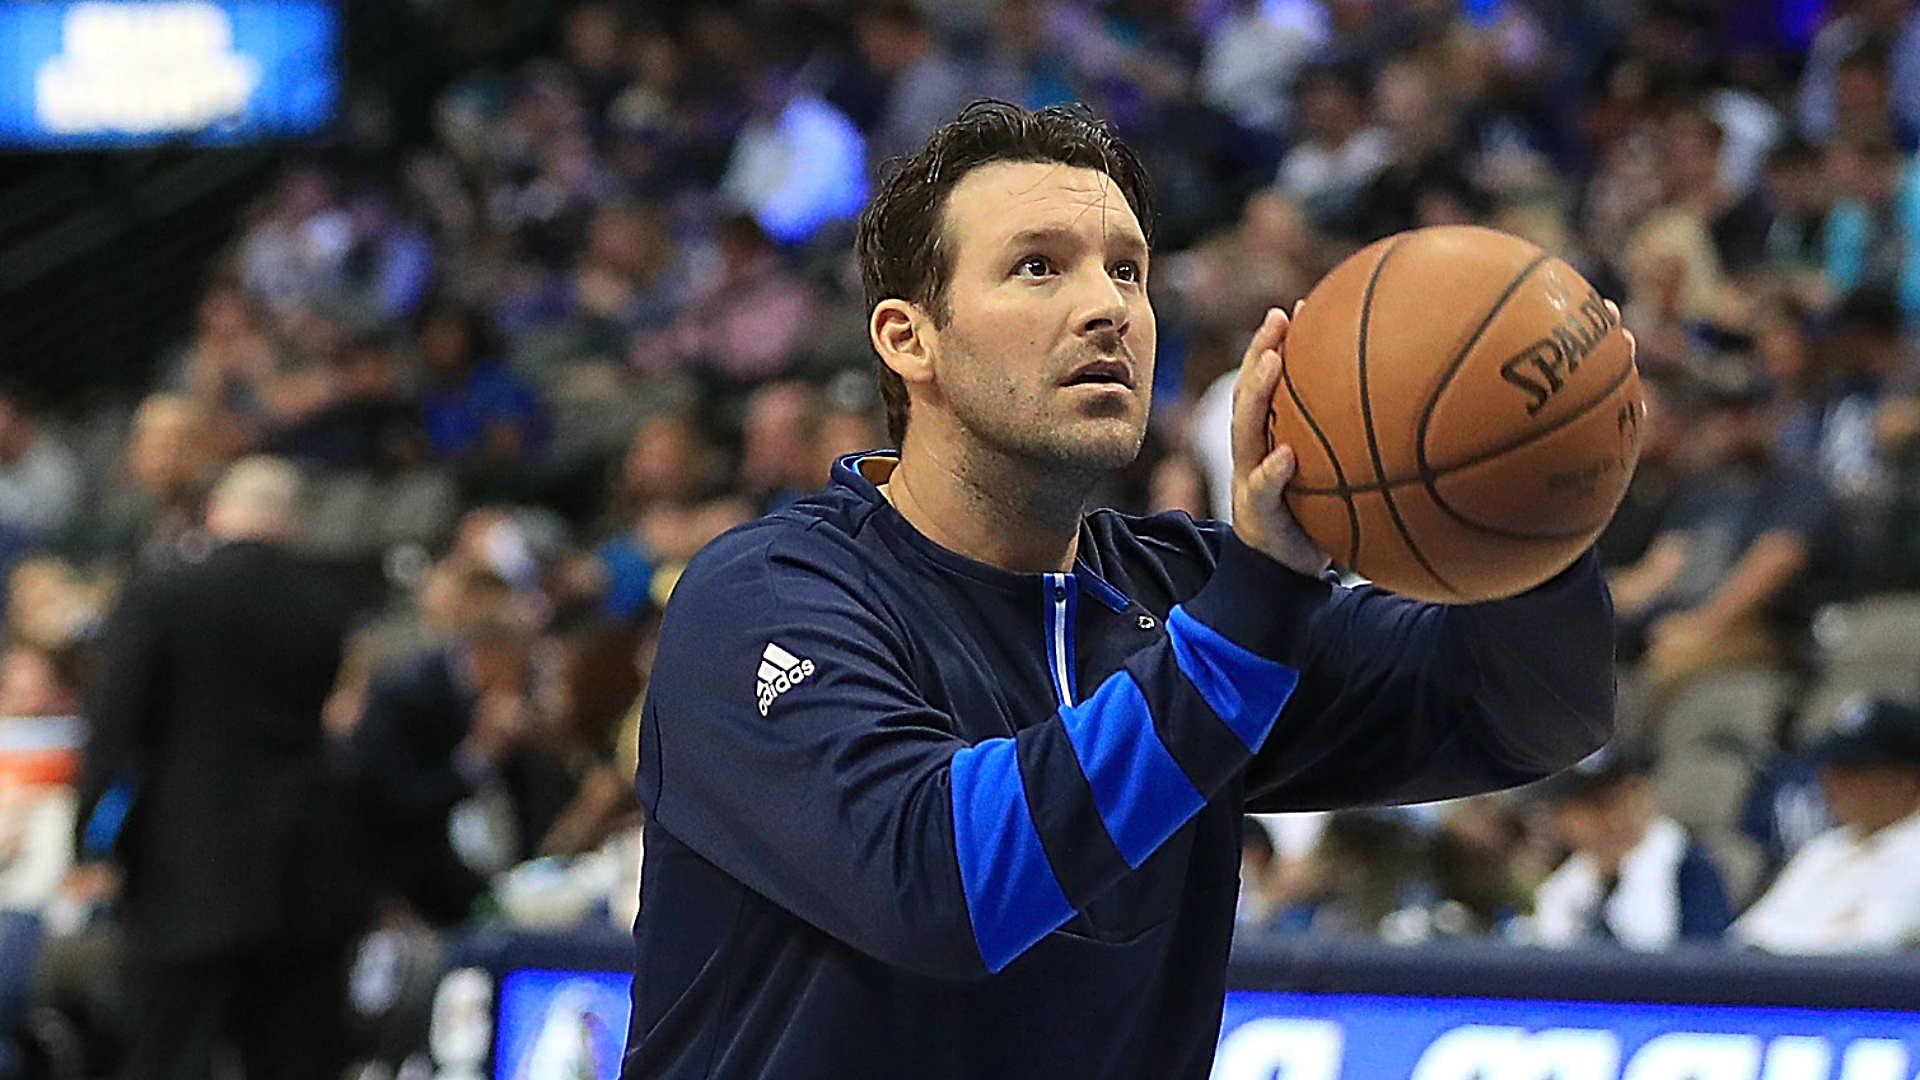 Nba Shut Down Plan For Tony Romo To Play Mavericks